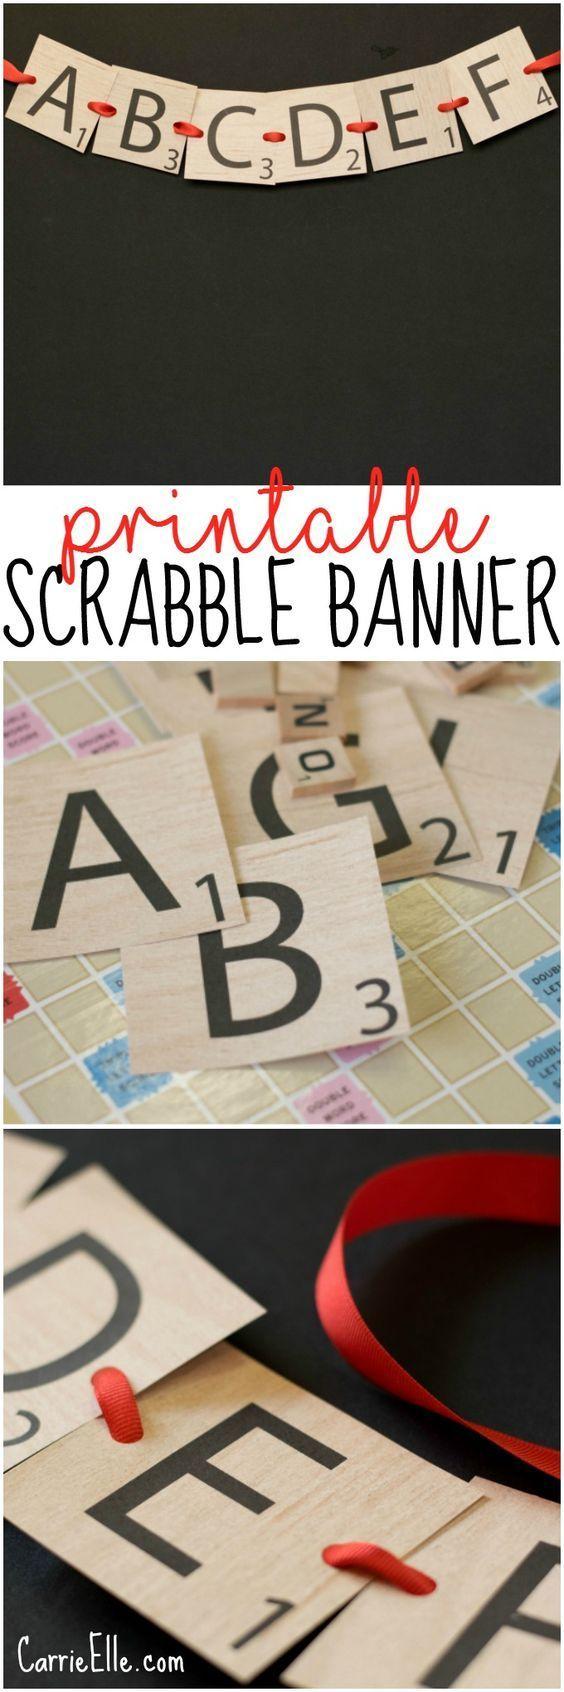 Scrabble Letter Printable Banner 541 best Templates